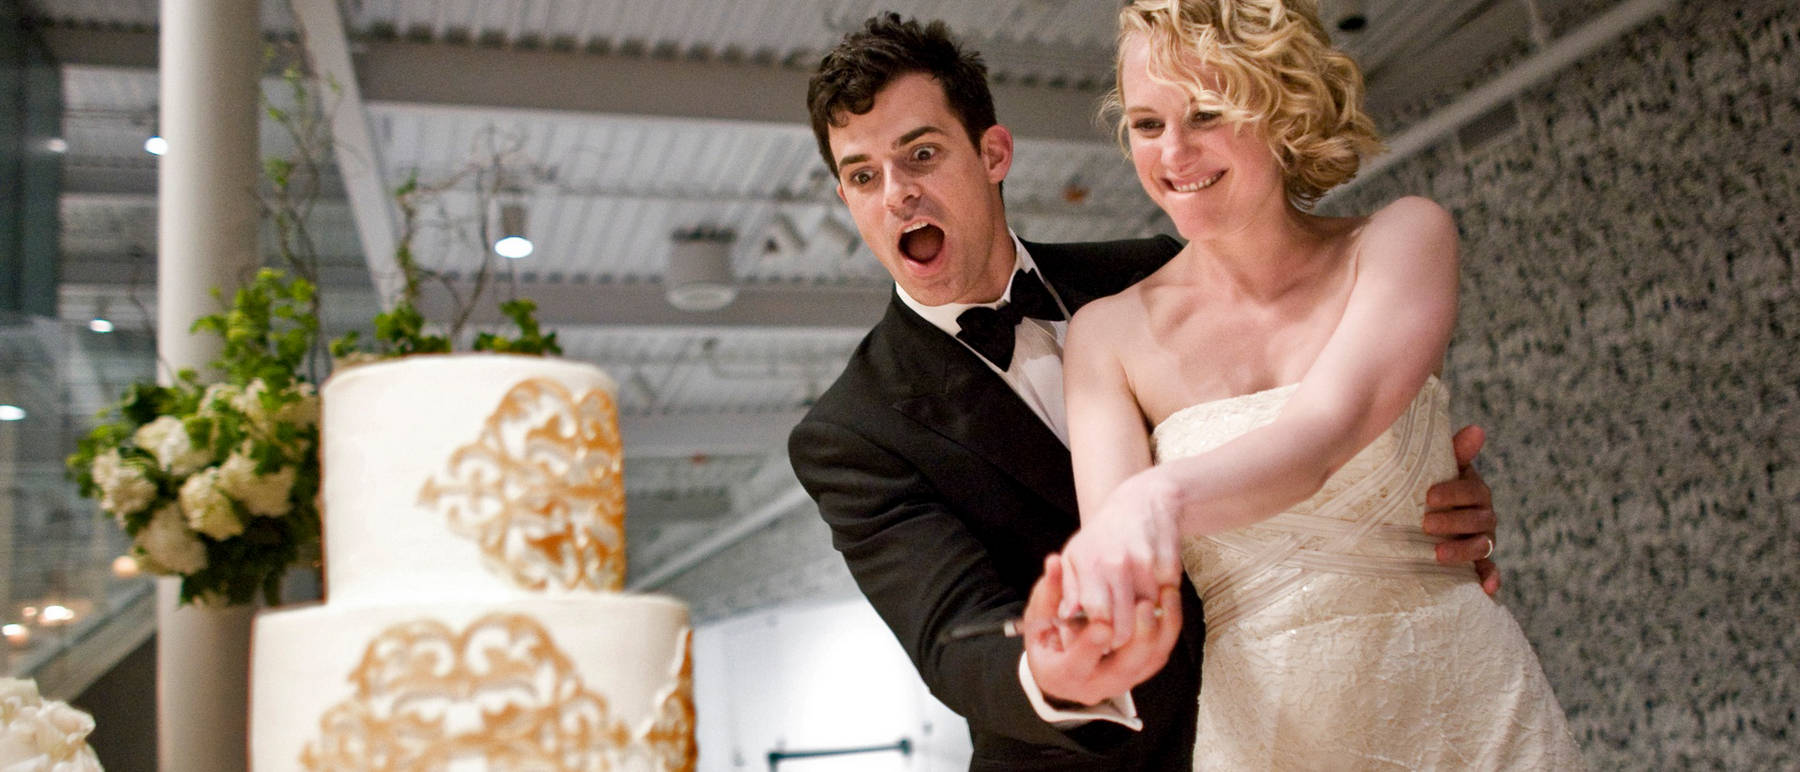 johnandjoseph-wedding-photographer-hz-slider-381